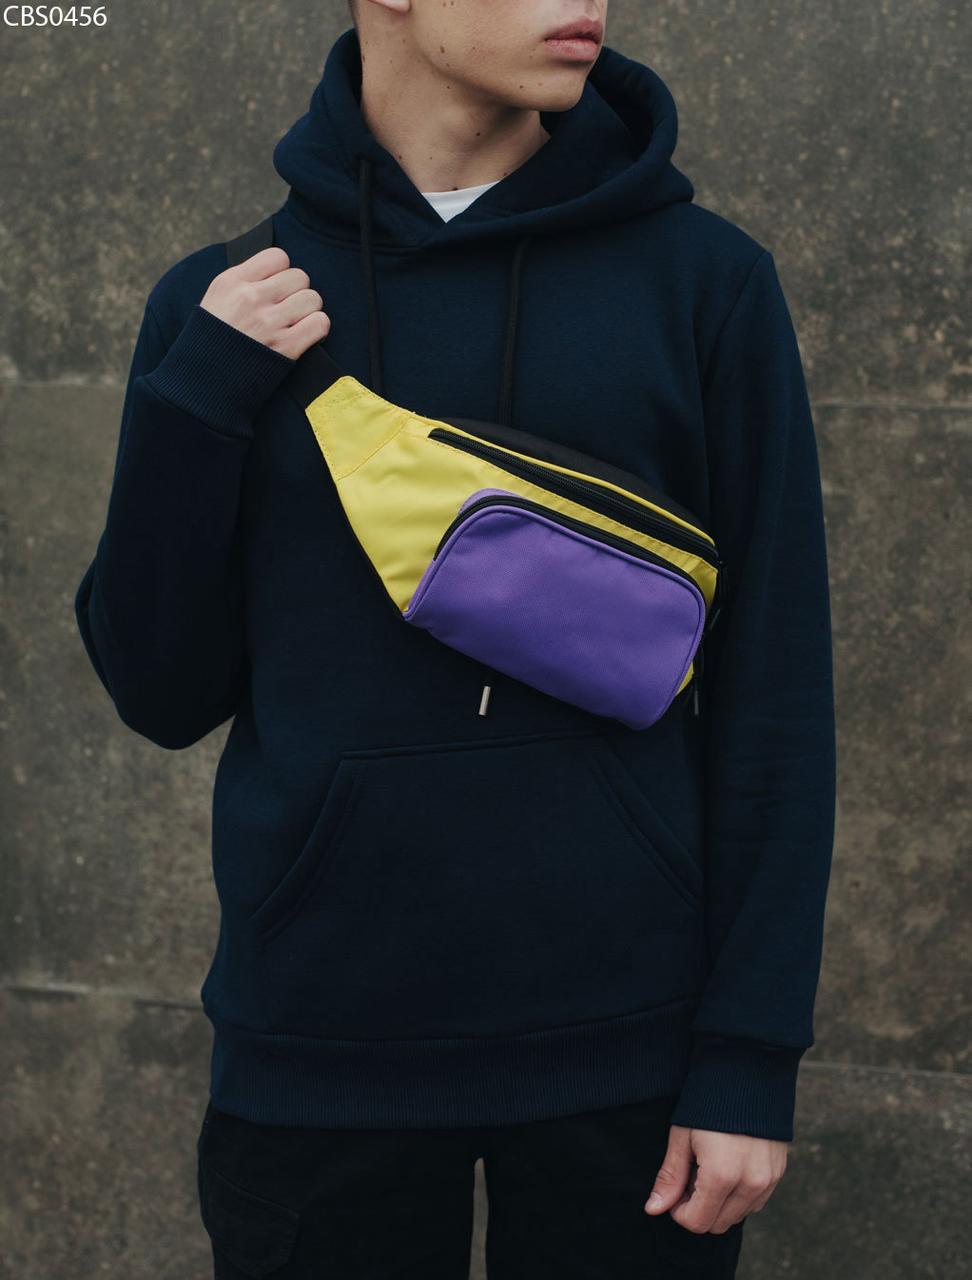 Поясная сумка Staff black purple yellow